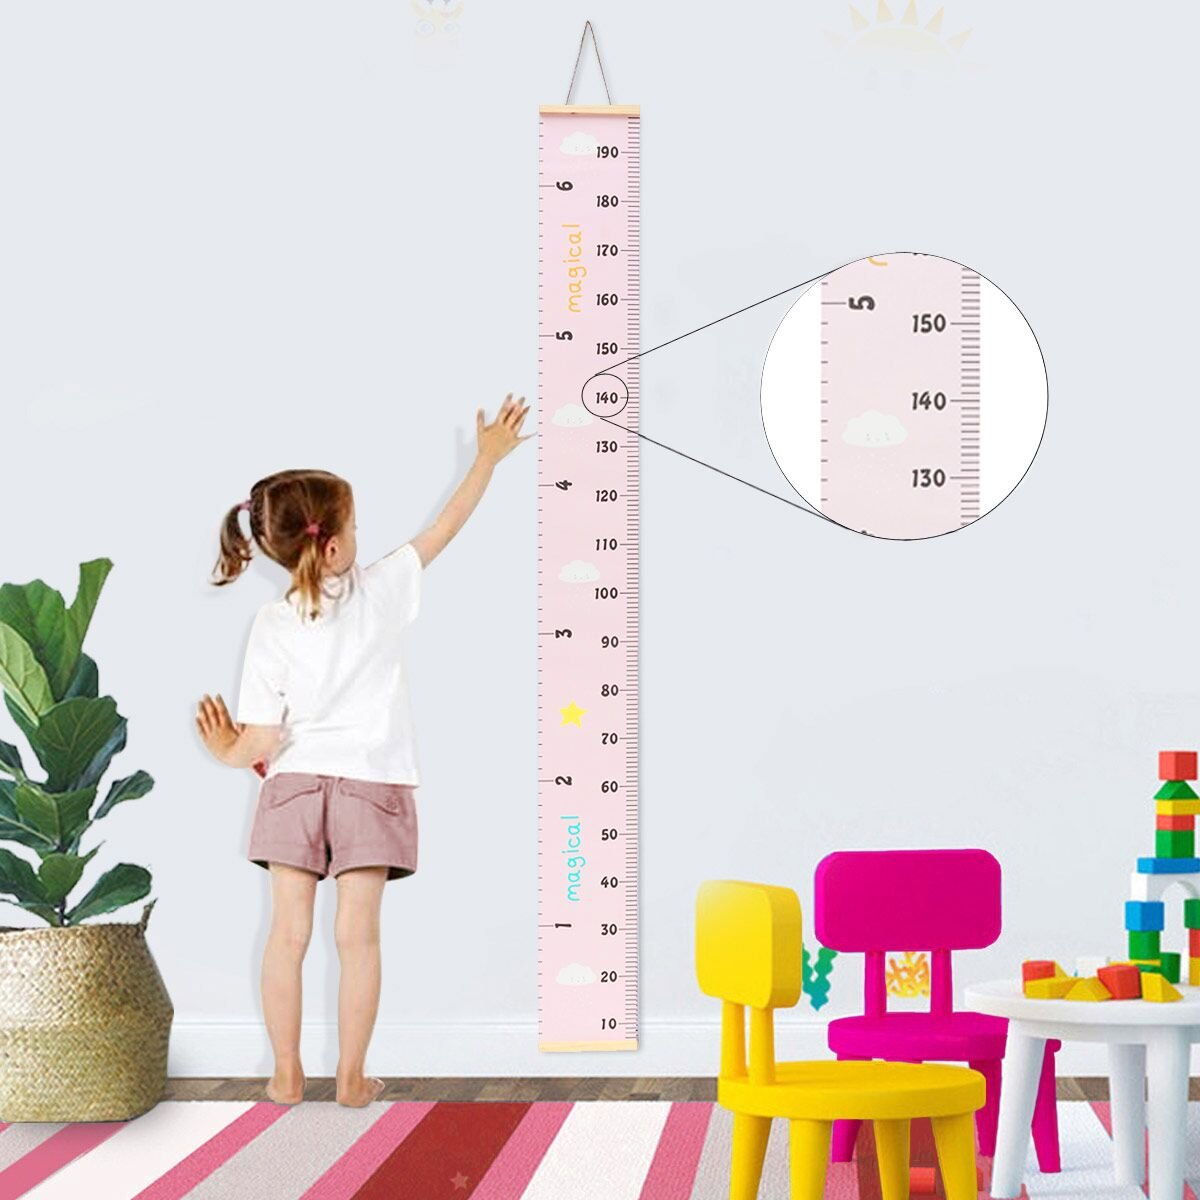 Full Size of Am Besten Bewertete Produkte In Der Kategorie Messlatten Fr Regal Kinderzimmer Weiß Sofa Regale Kinderzimmer Messlatte Kinderzimmer